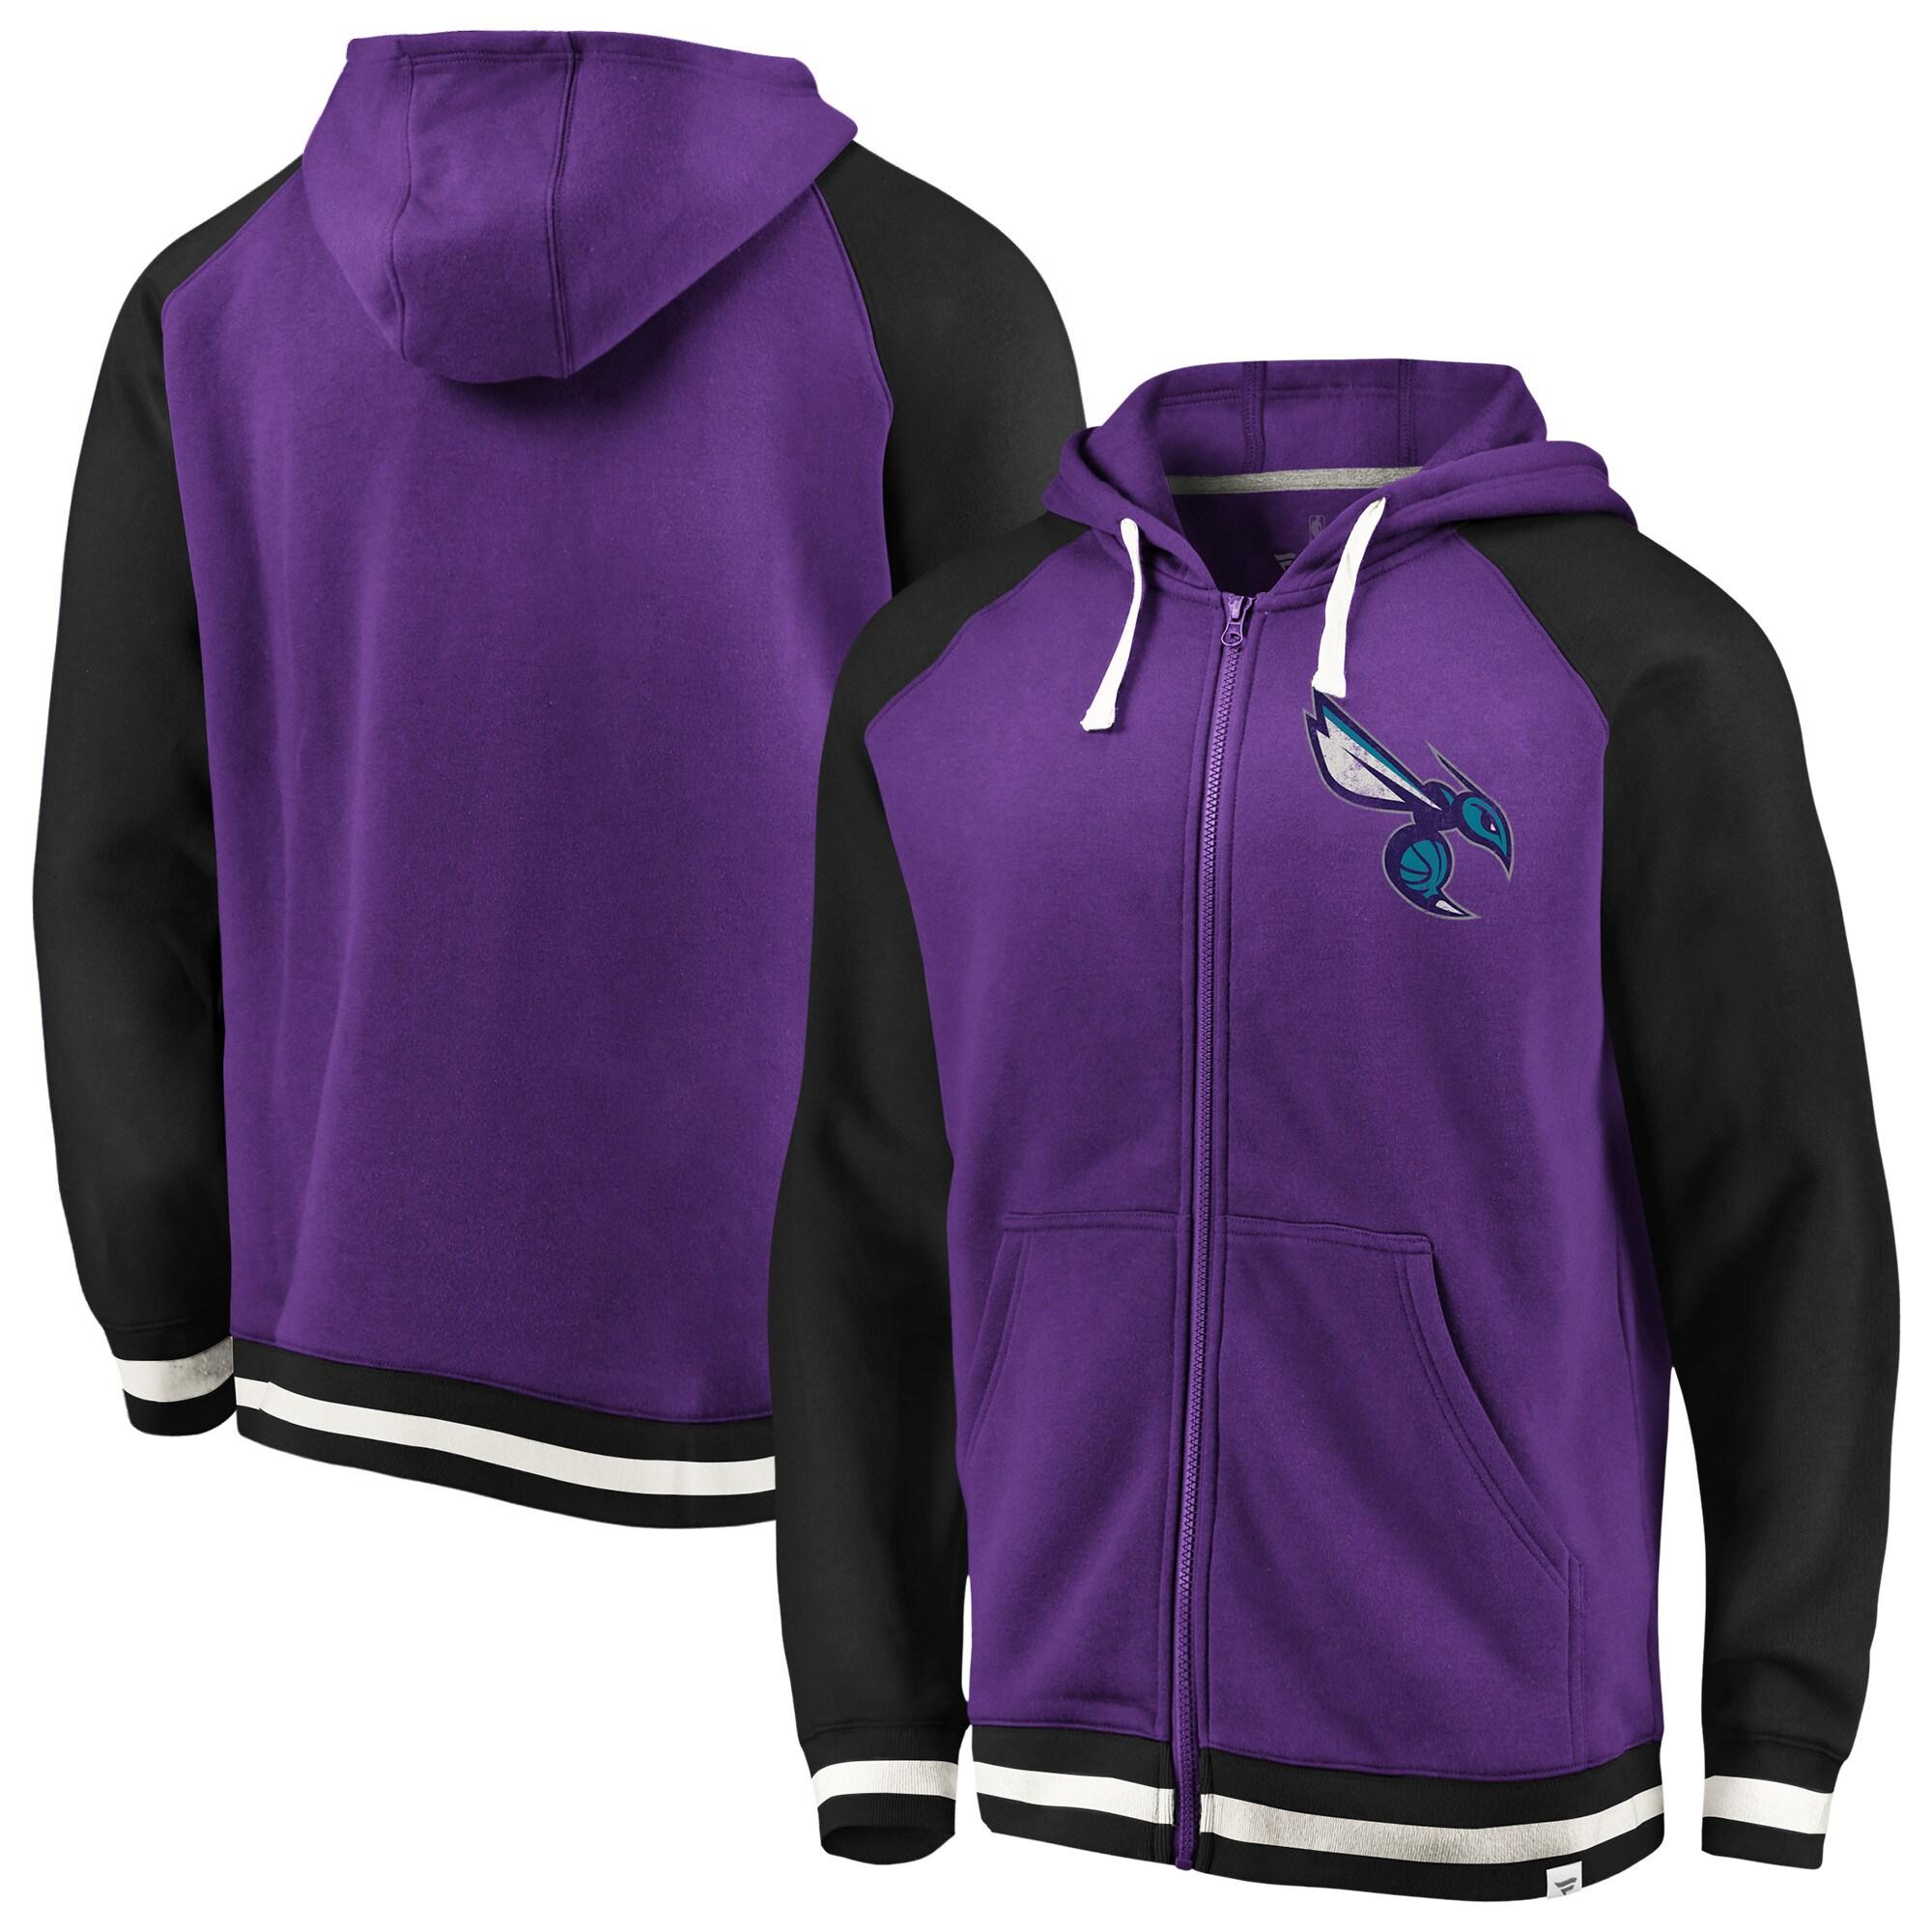 Charlotte Hornets Fanatics Branded True Classic Vintage Retro Stripe Fleece Full-Zip Hoodie - Purple/Black